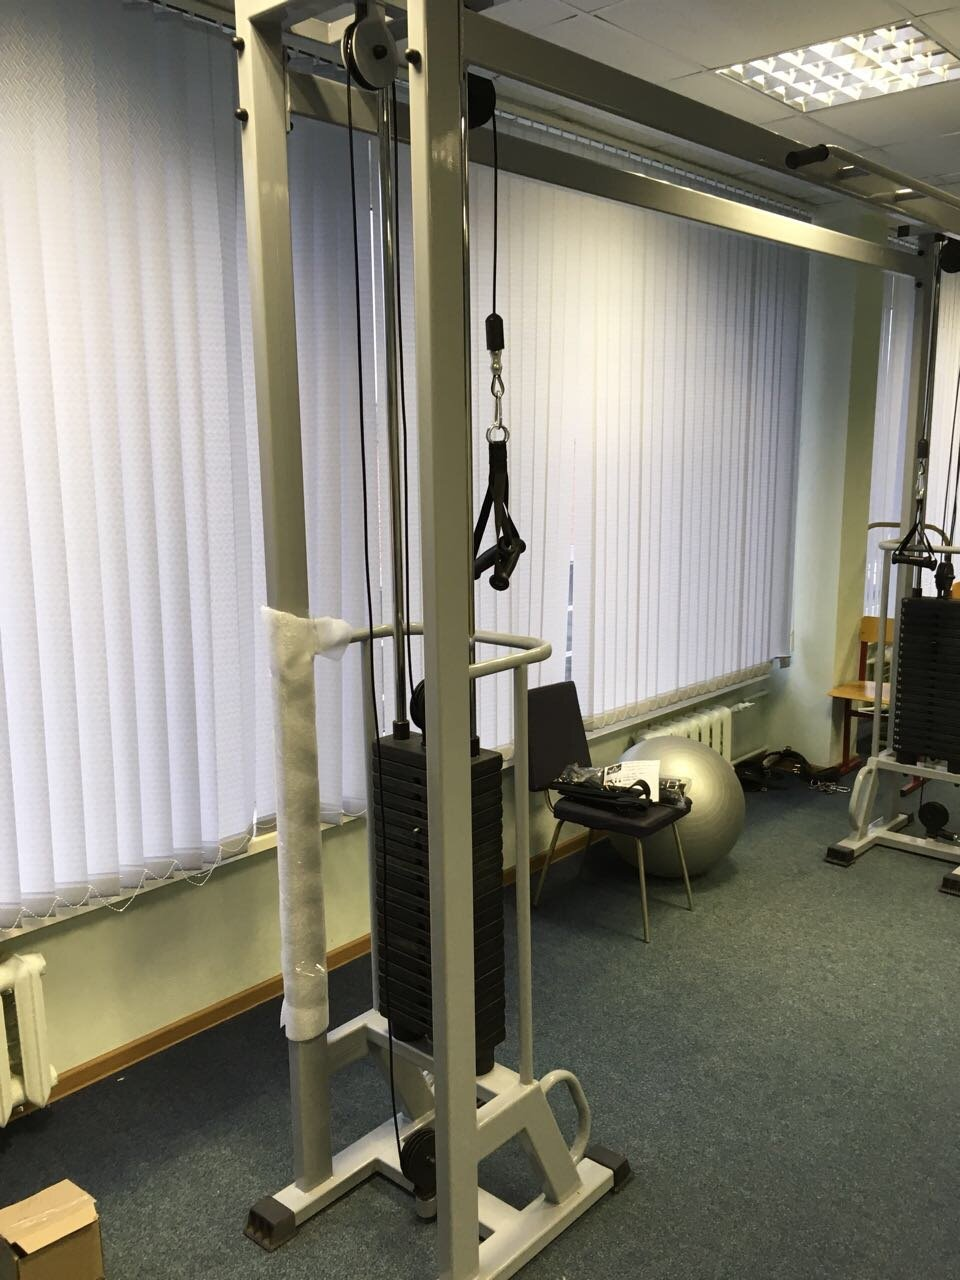 клиники специализирующиеся на лечении опорно двигательного аппарата